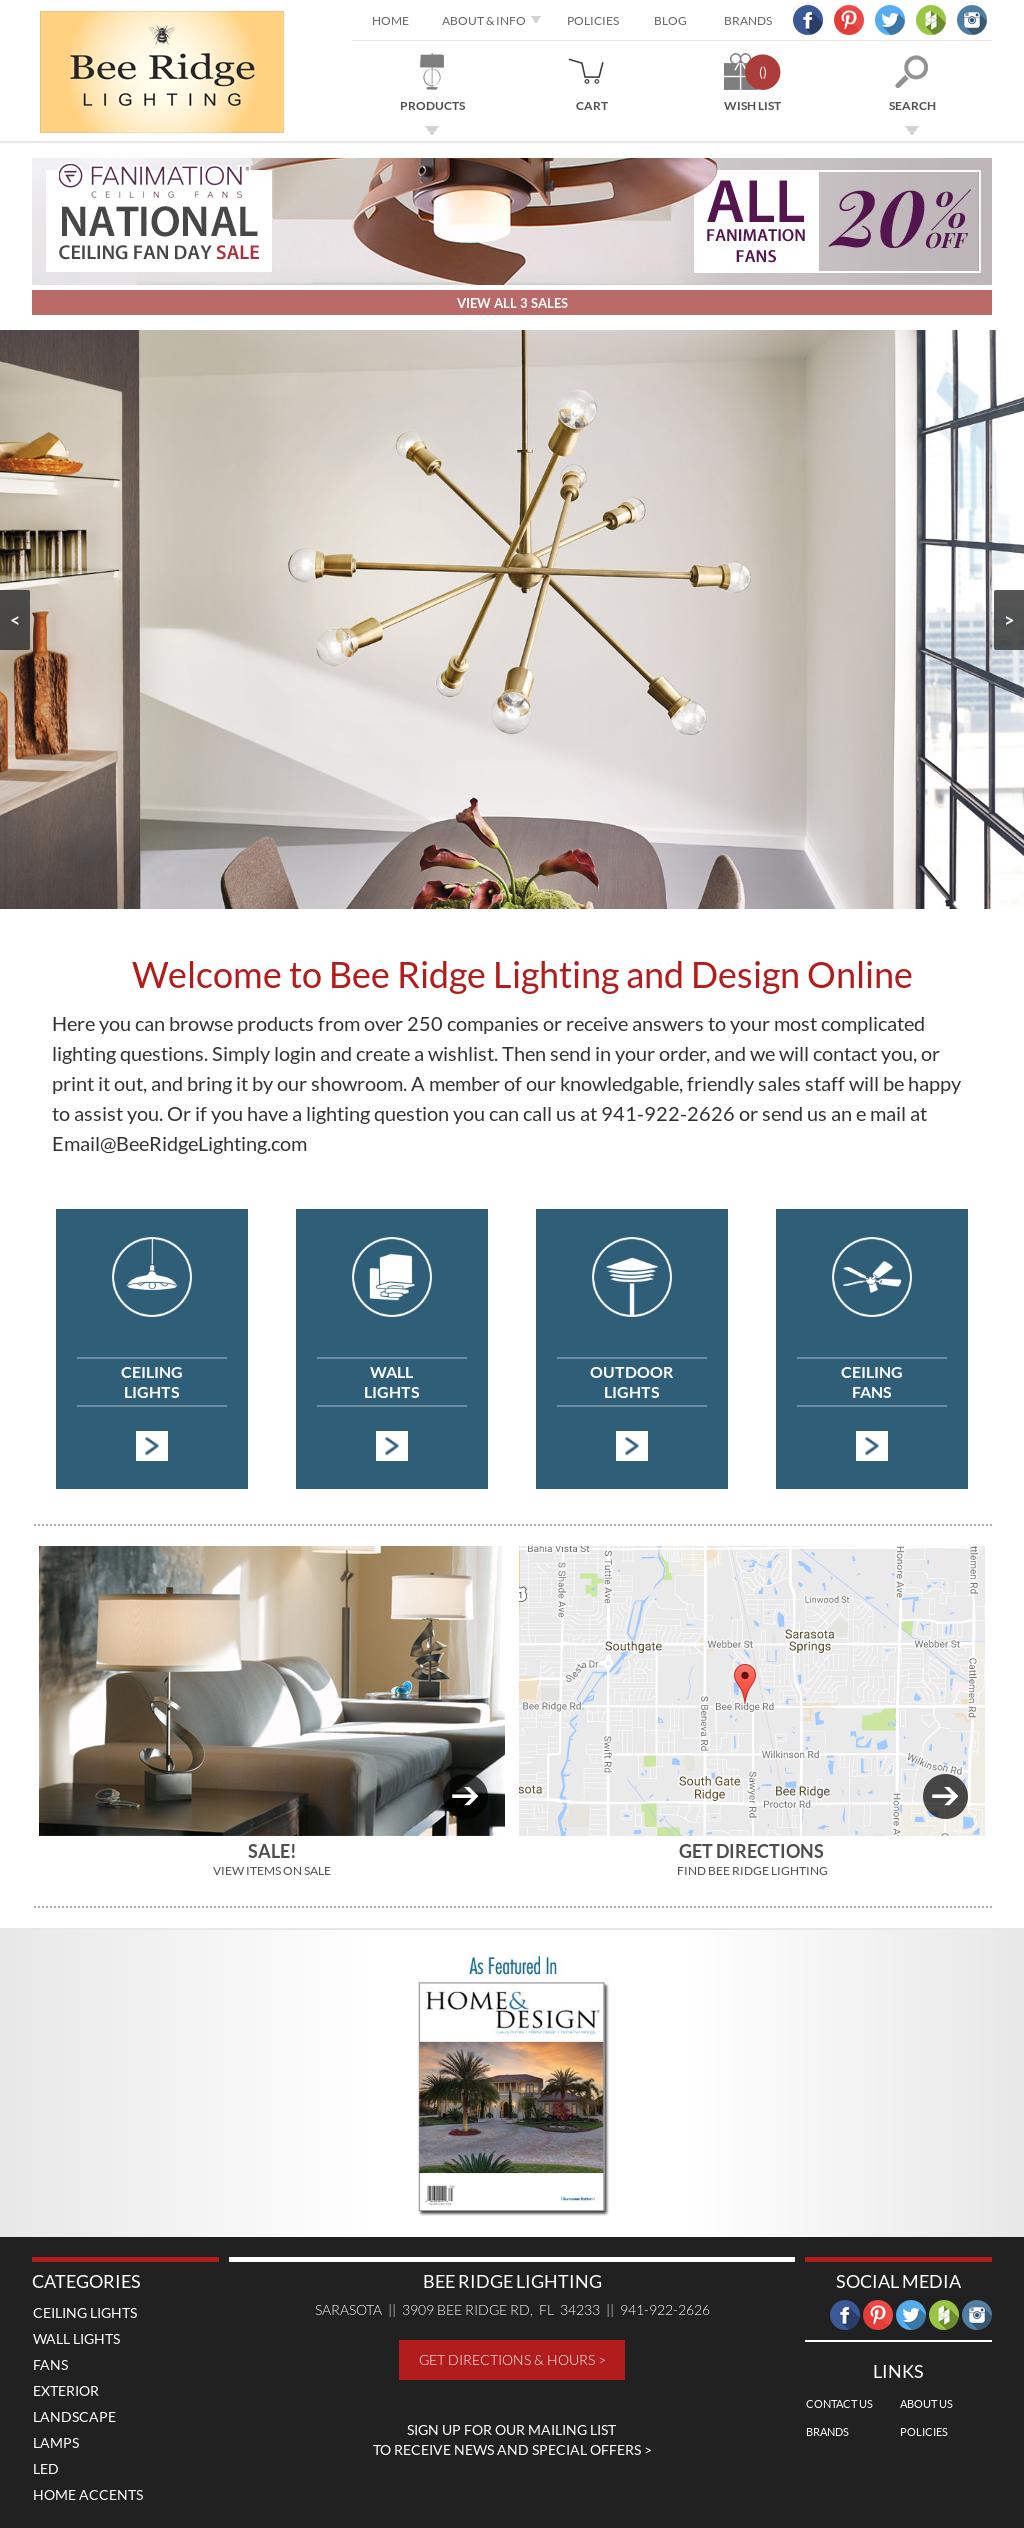 Bee Ridge Lighting Trendy News With Bee Ridge Lighting Gallery Of